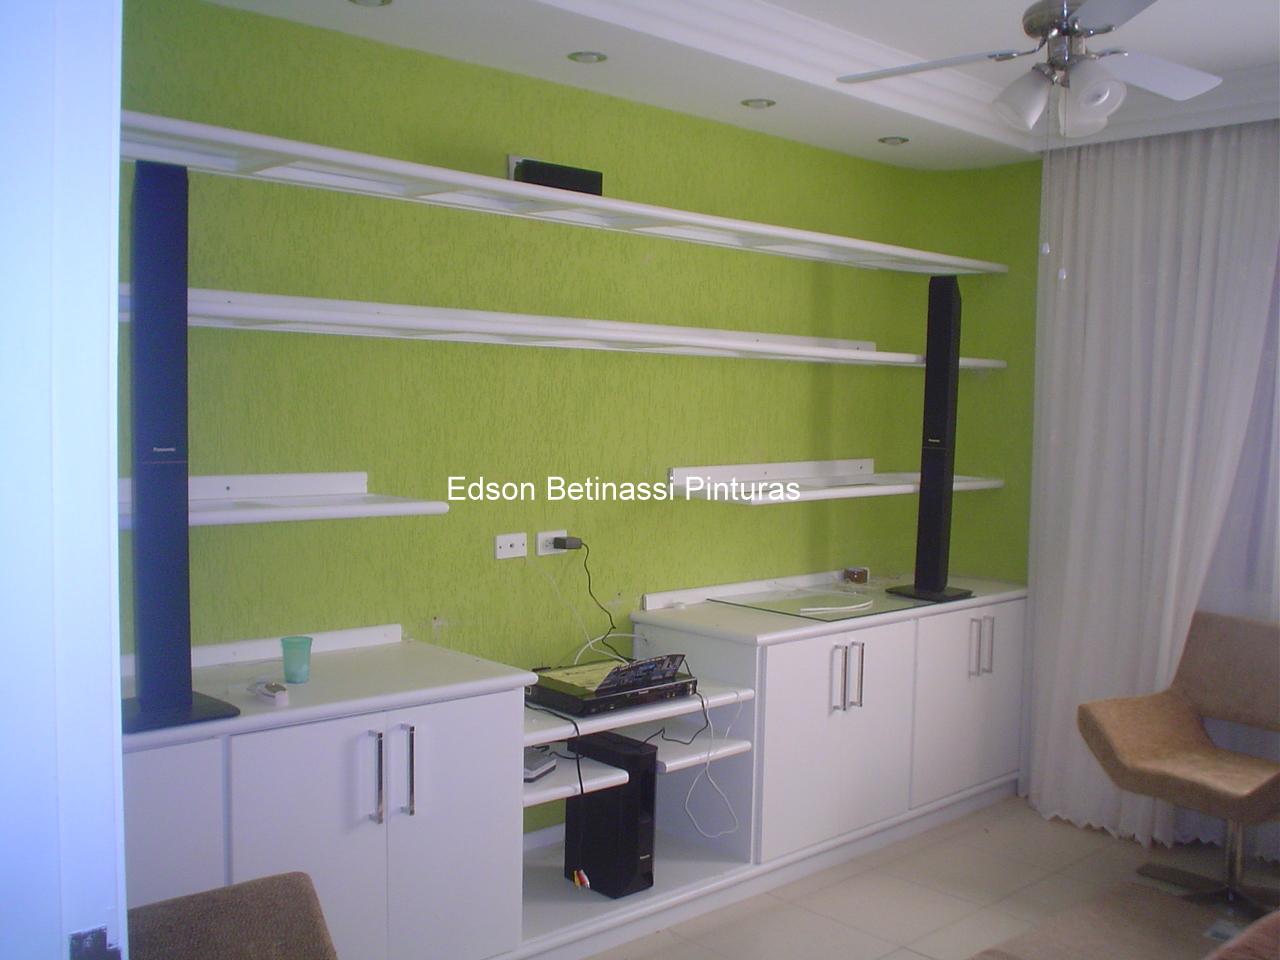 Pinturas de tito salas v rias id ias de - Pinturas para salas ...